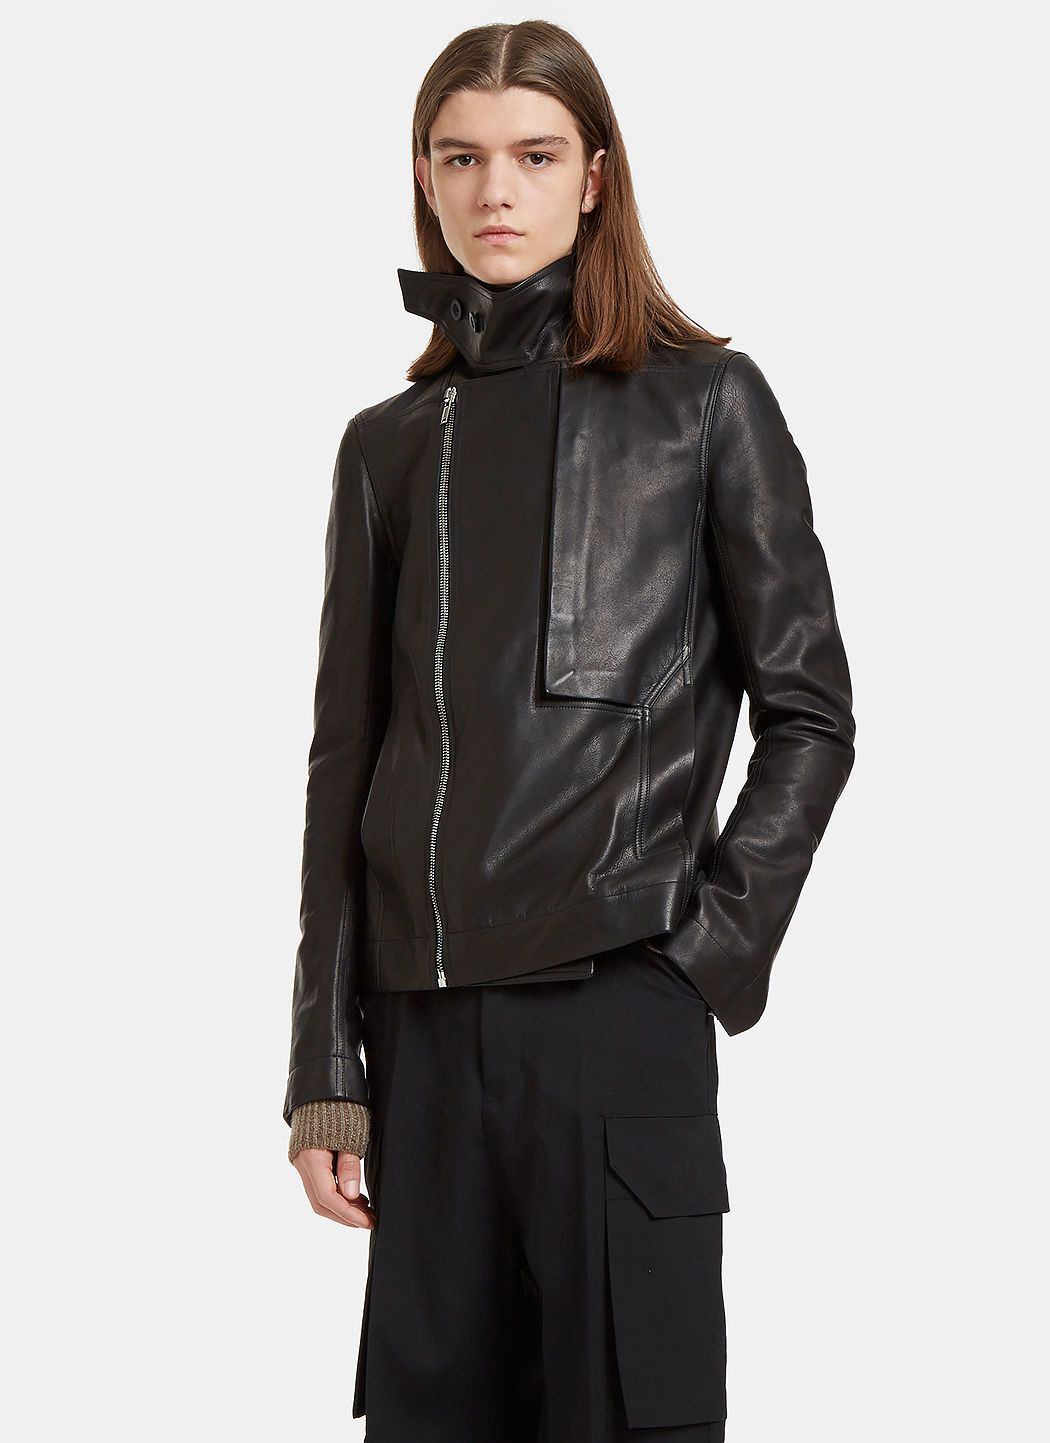 Rick owens men's leather jacket